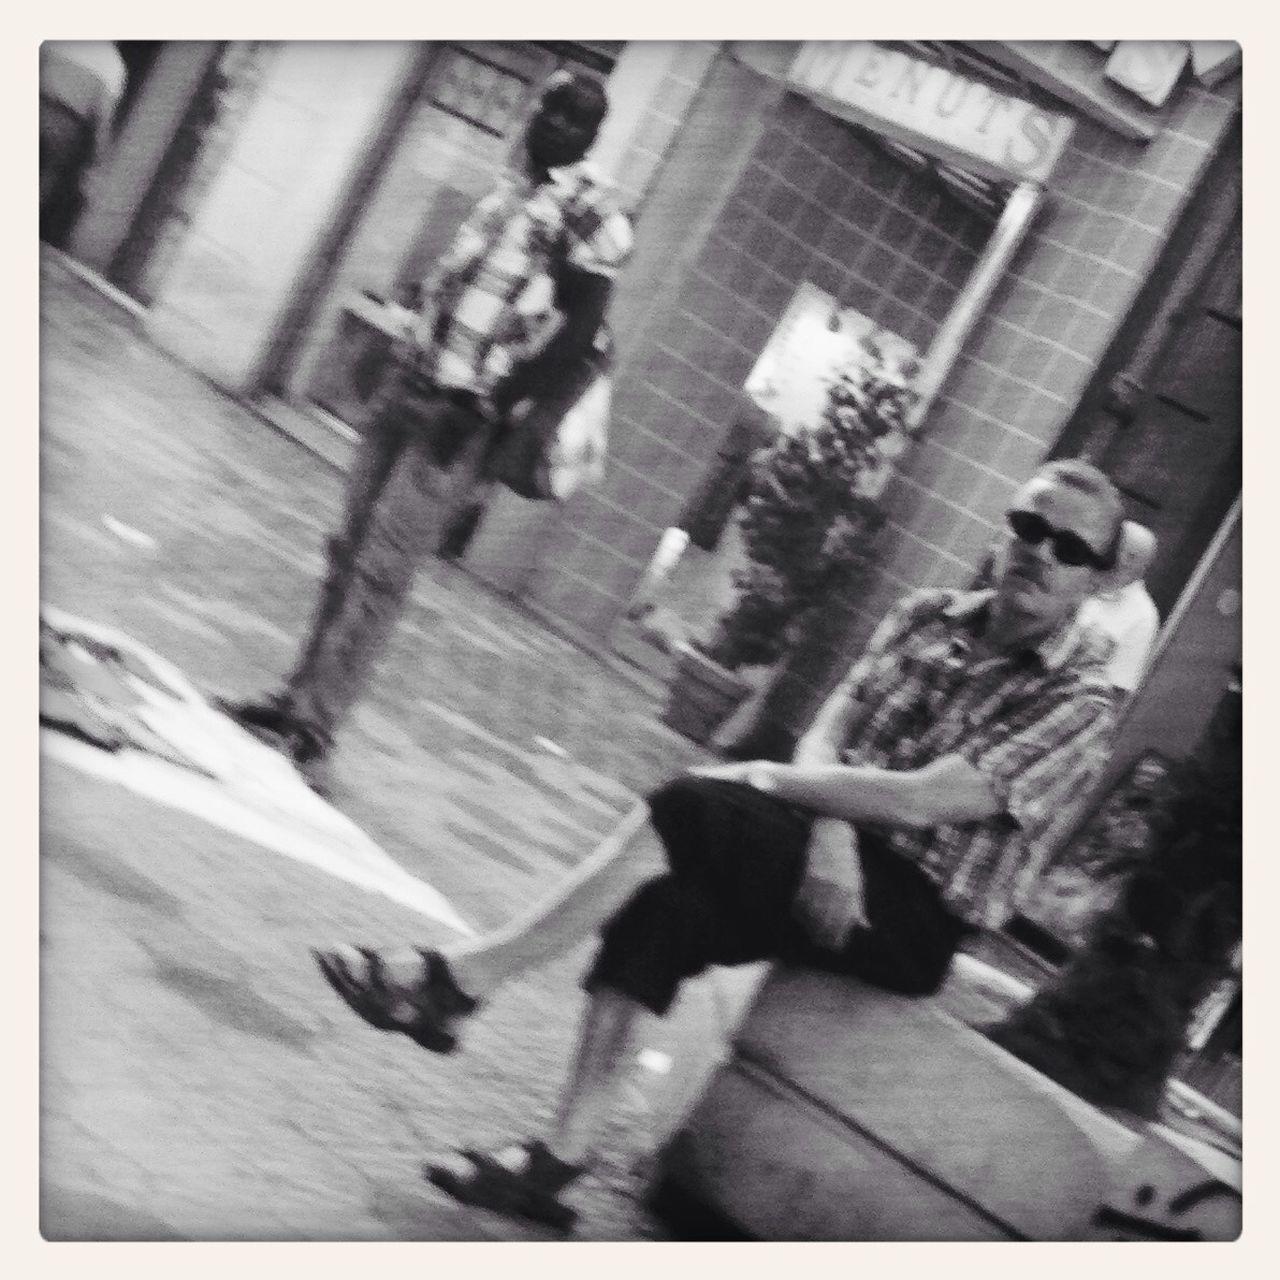 Shootermag Blackandwhite Streetphotography Hipstamatic